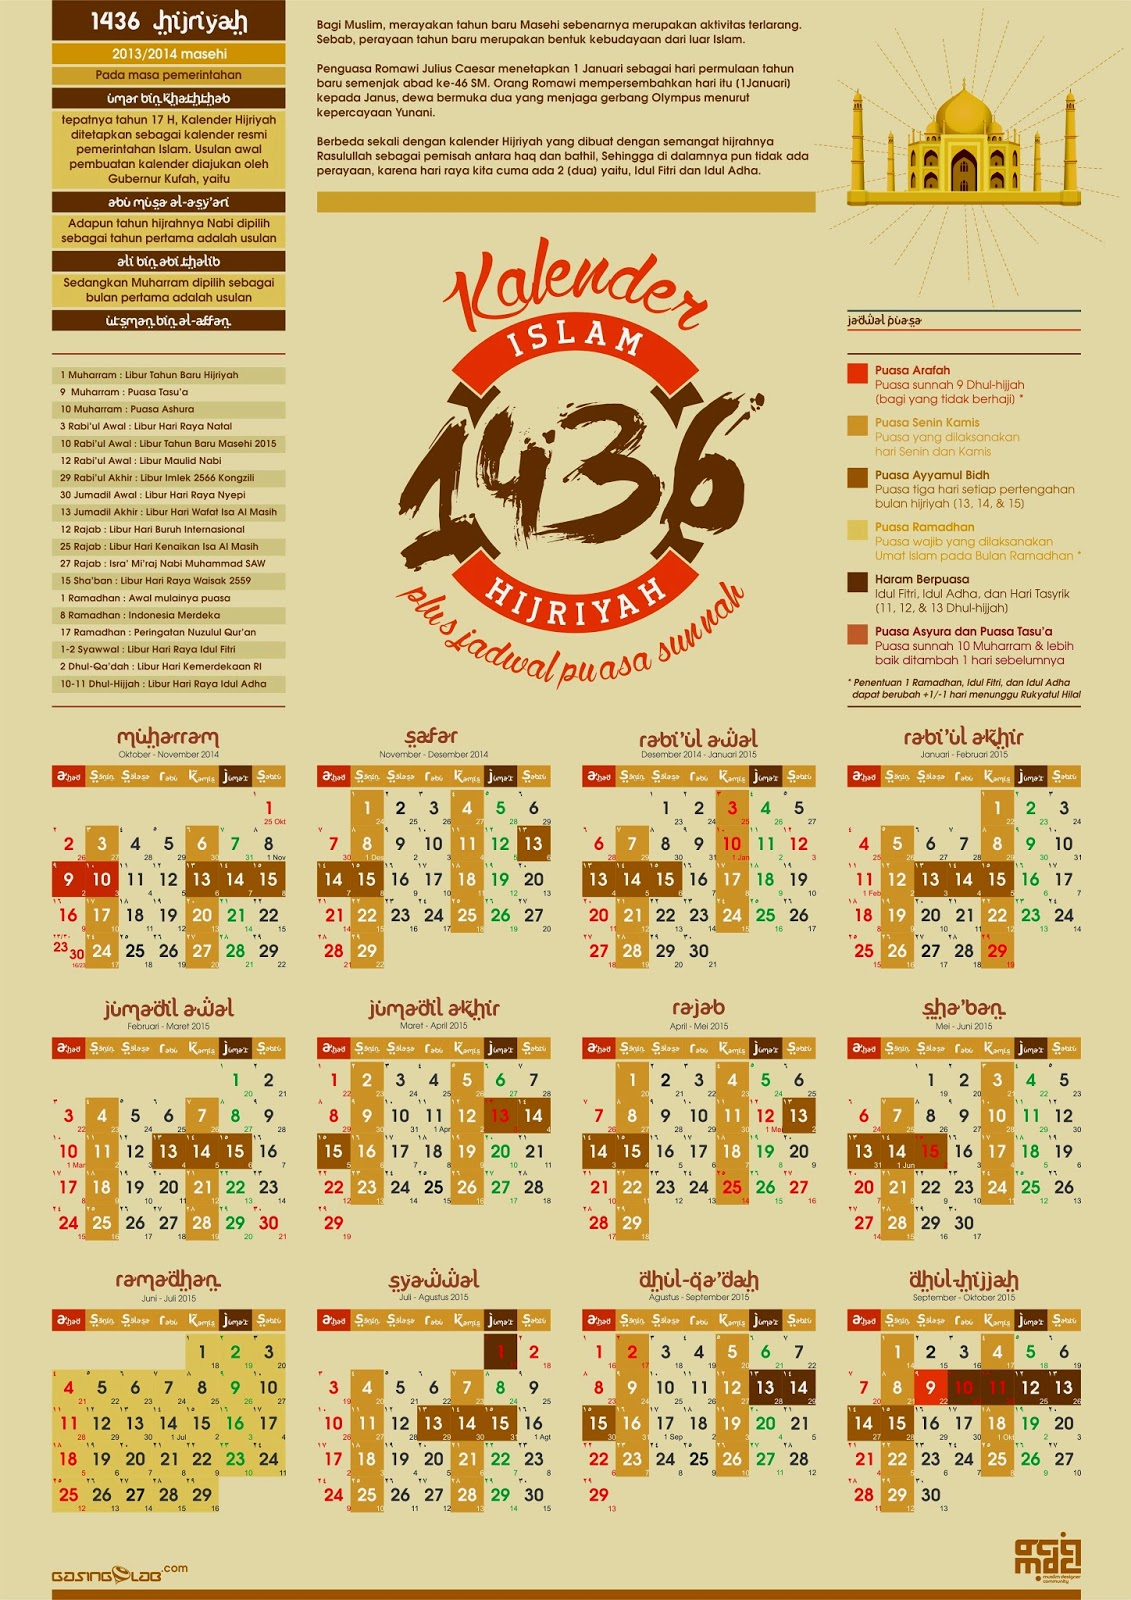 Gregorian Calendar 2014 Beserta Year 2016 Calendar Malaysia Time And Date Kalender Islam